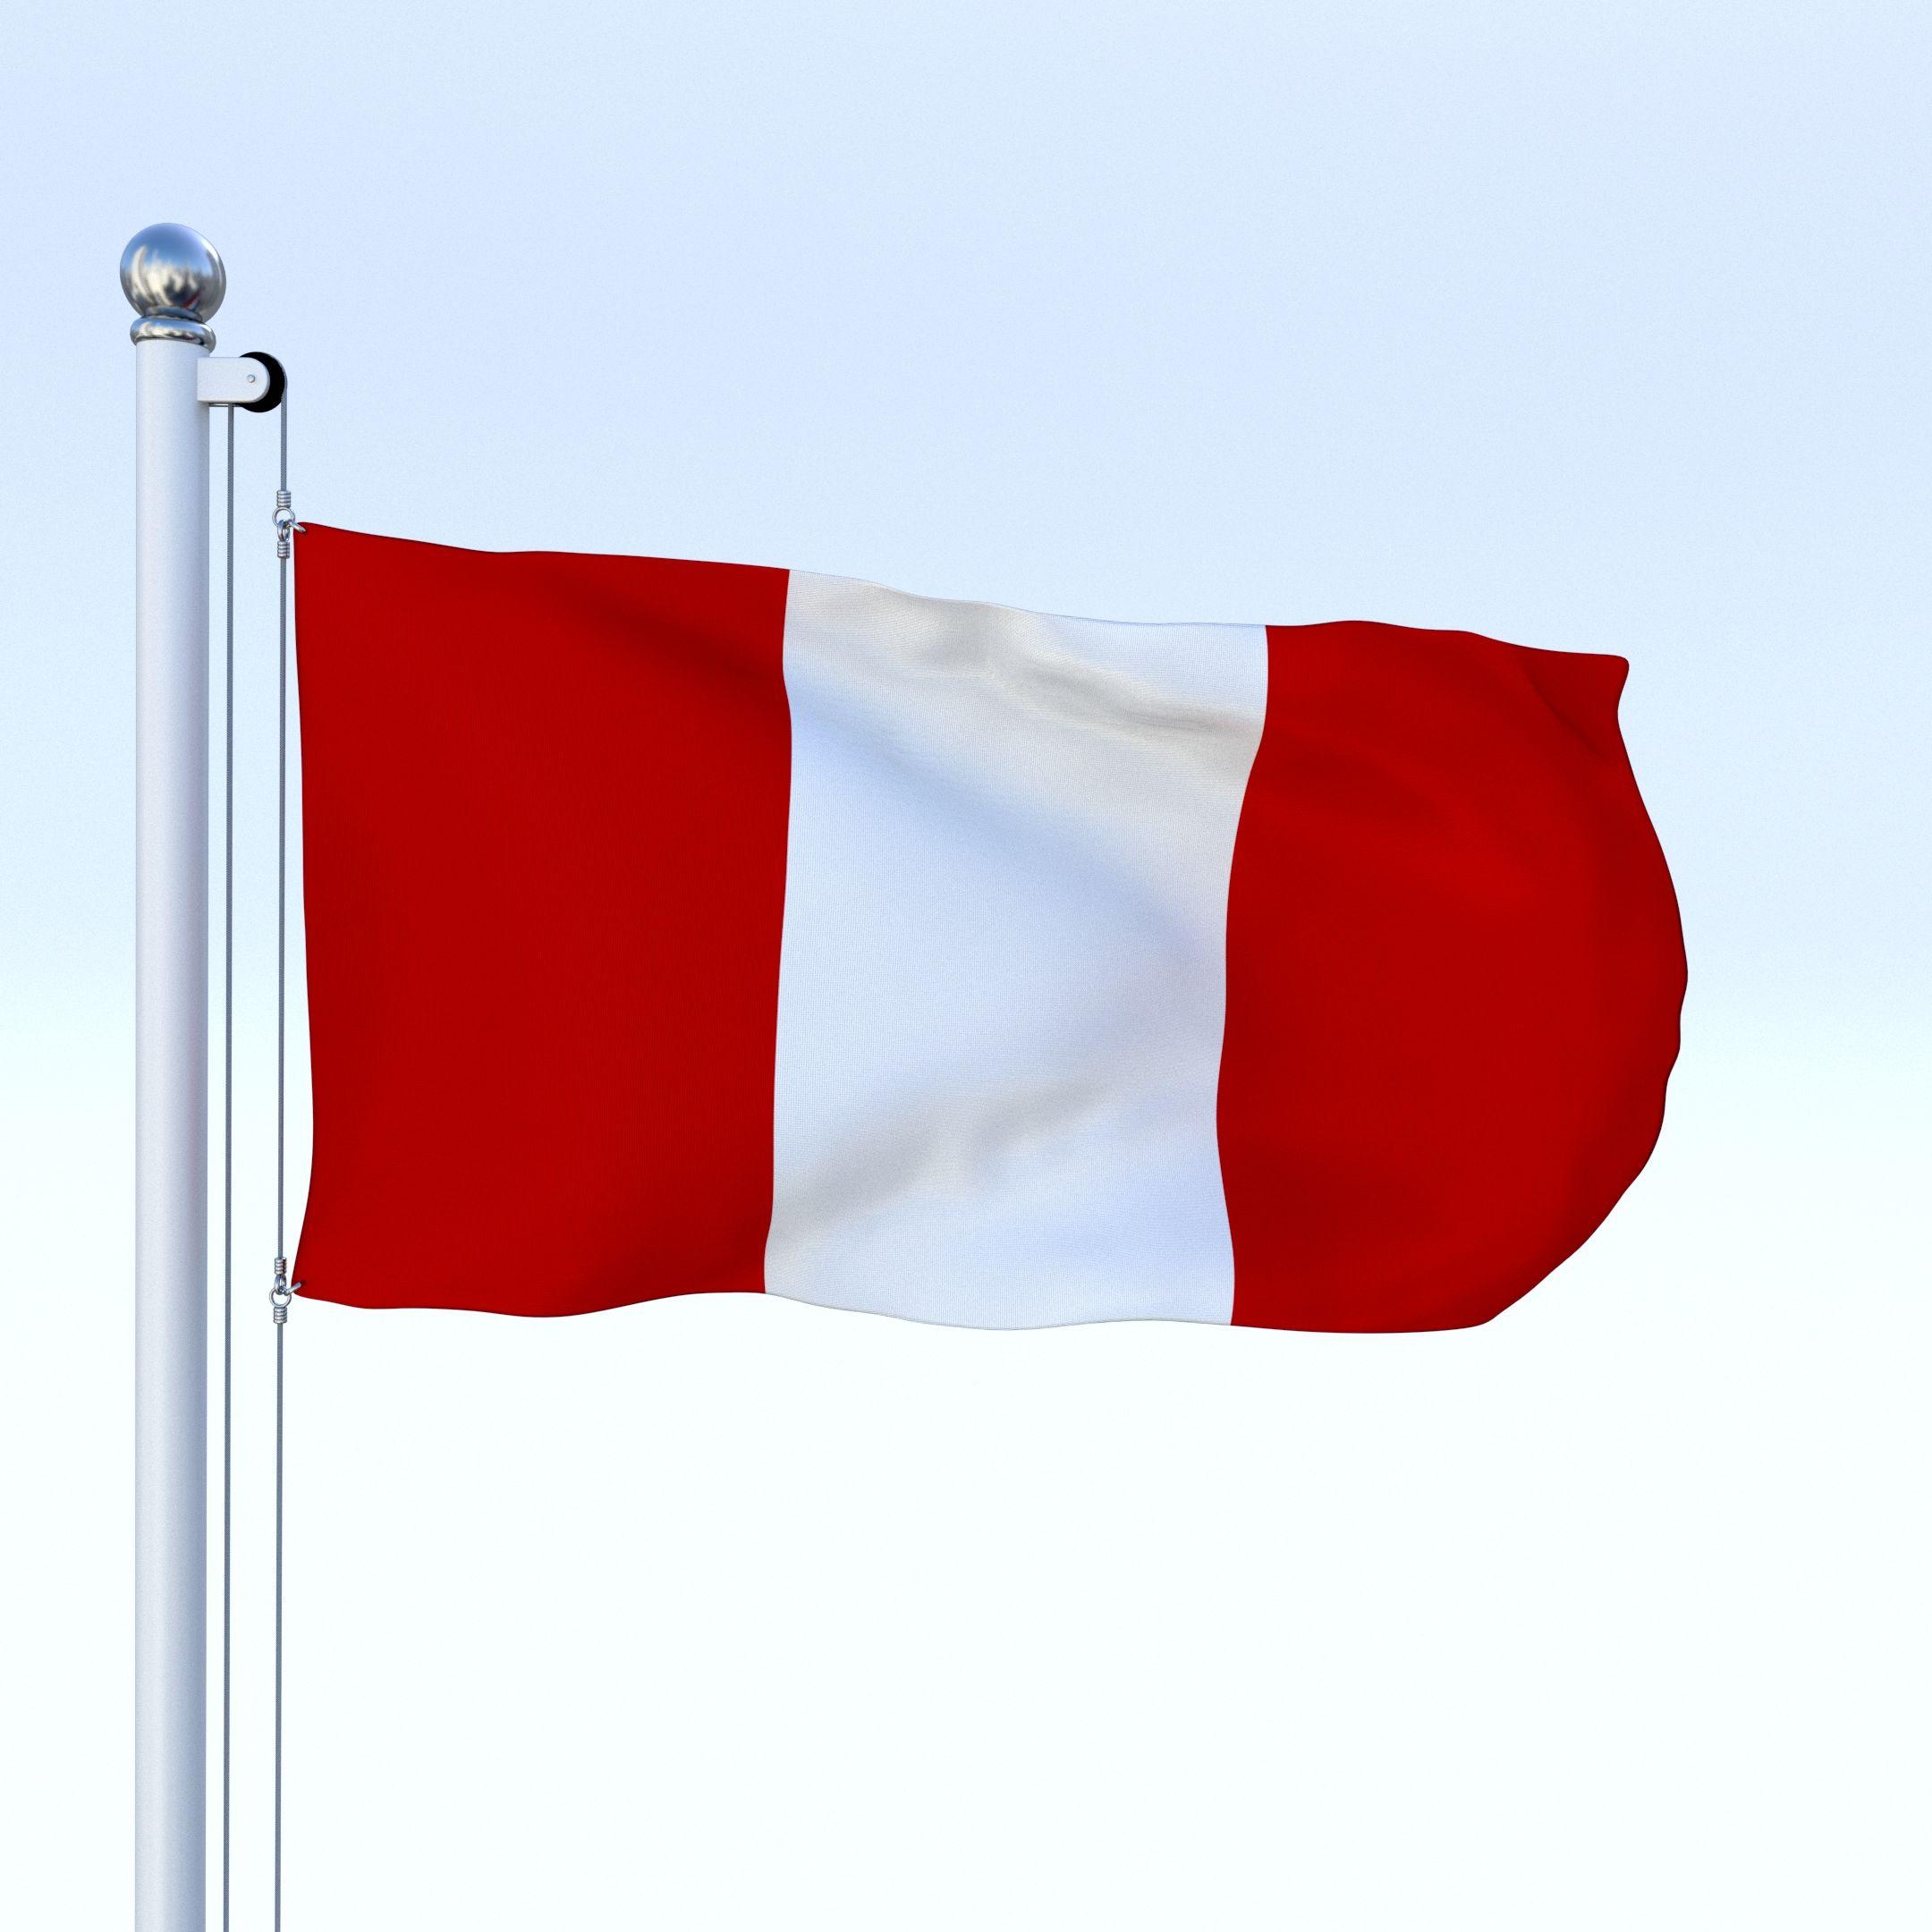 Animated Peru Flag Peru flag, Flag, Animation